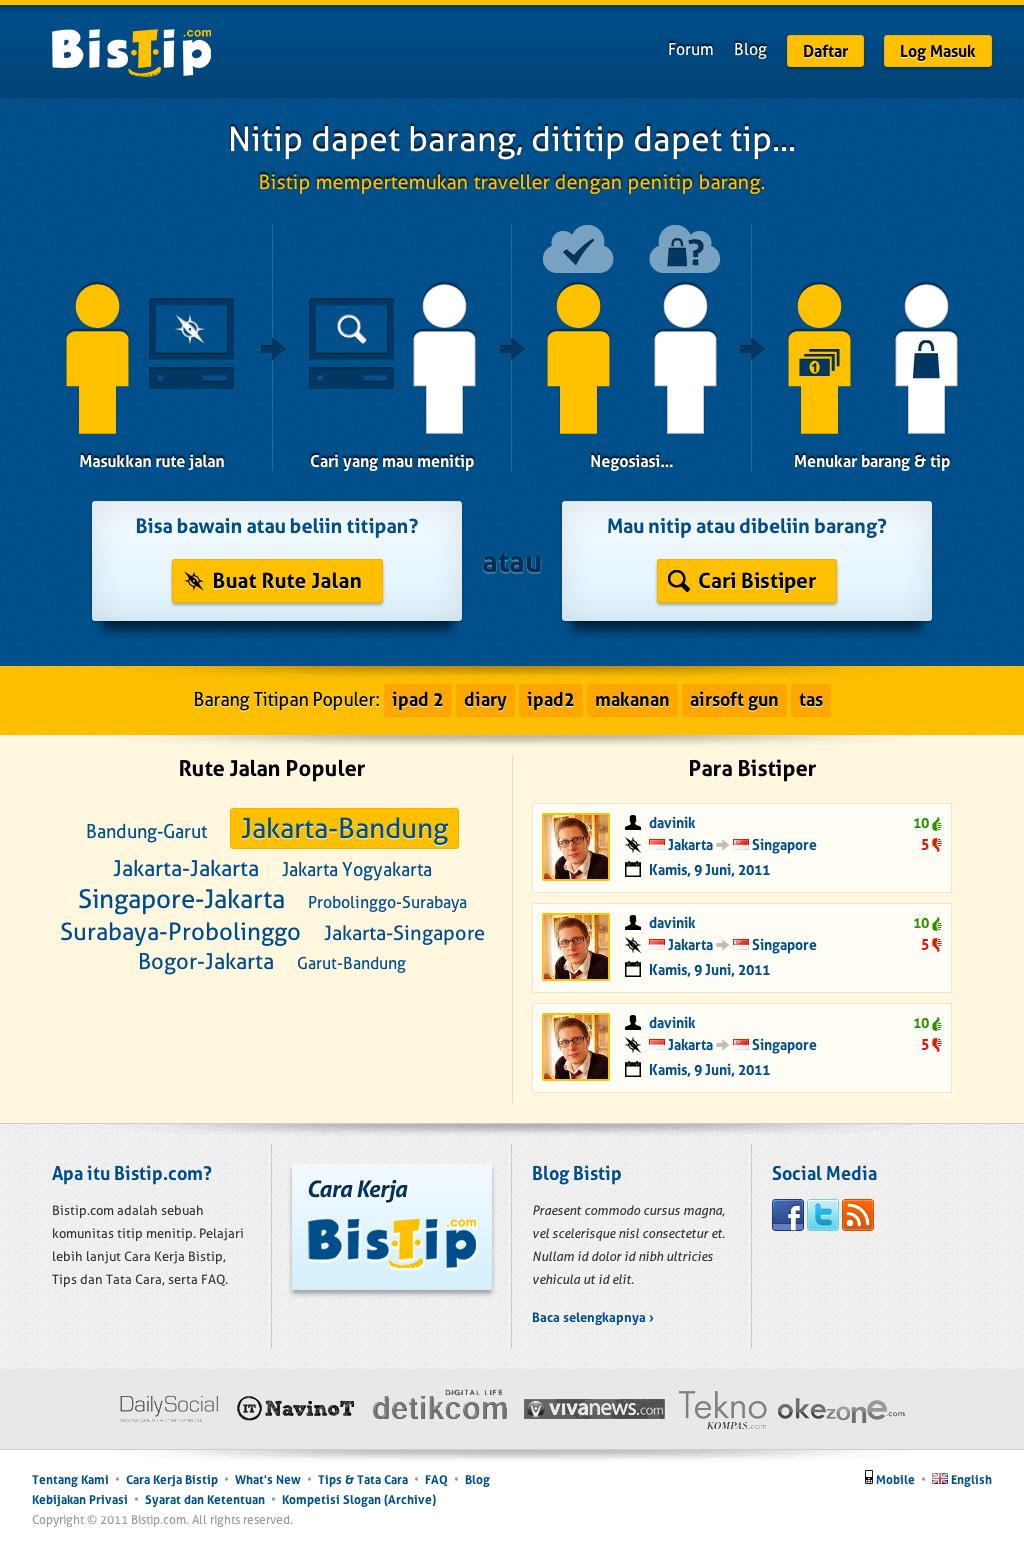 BisTip.com